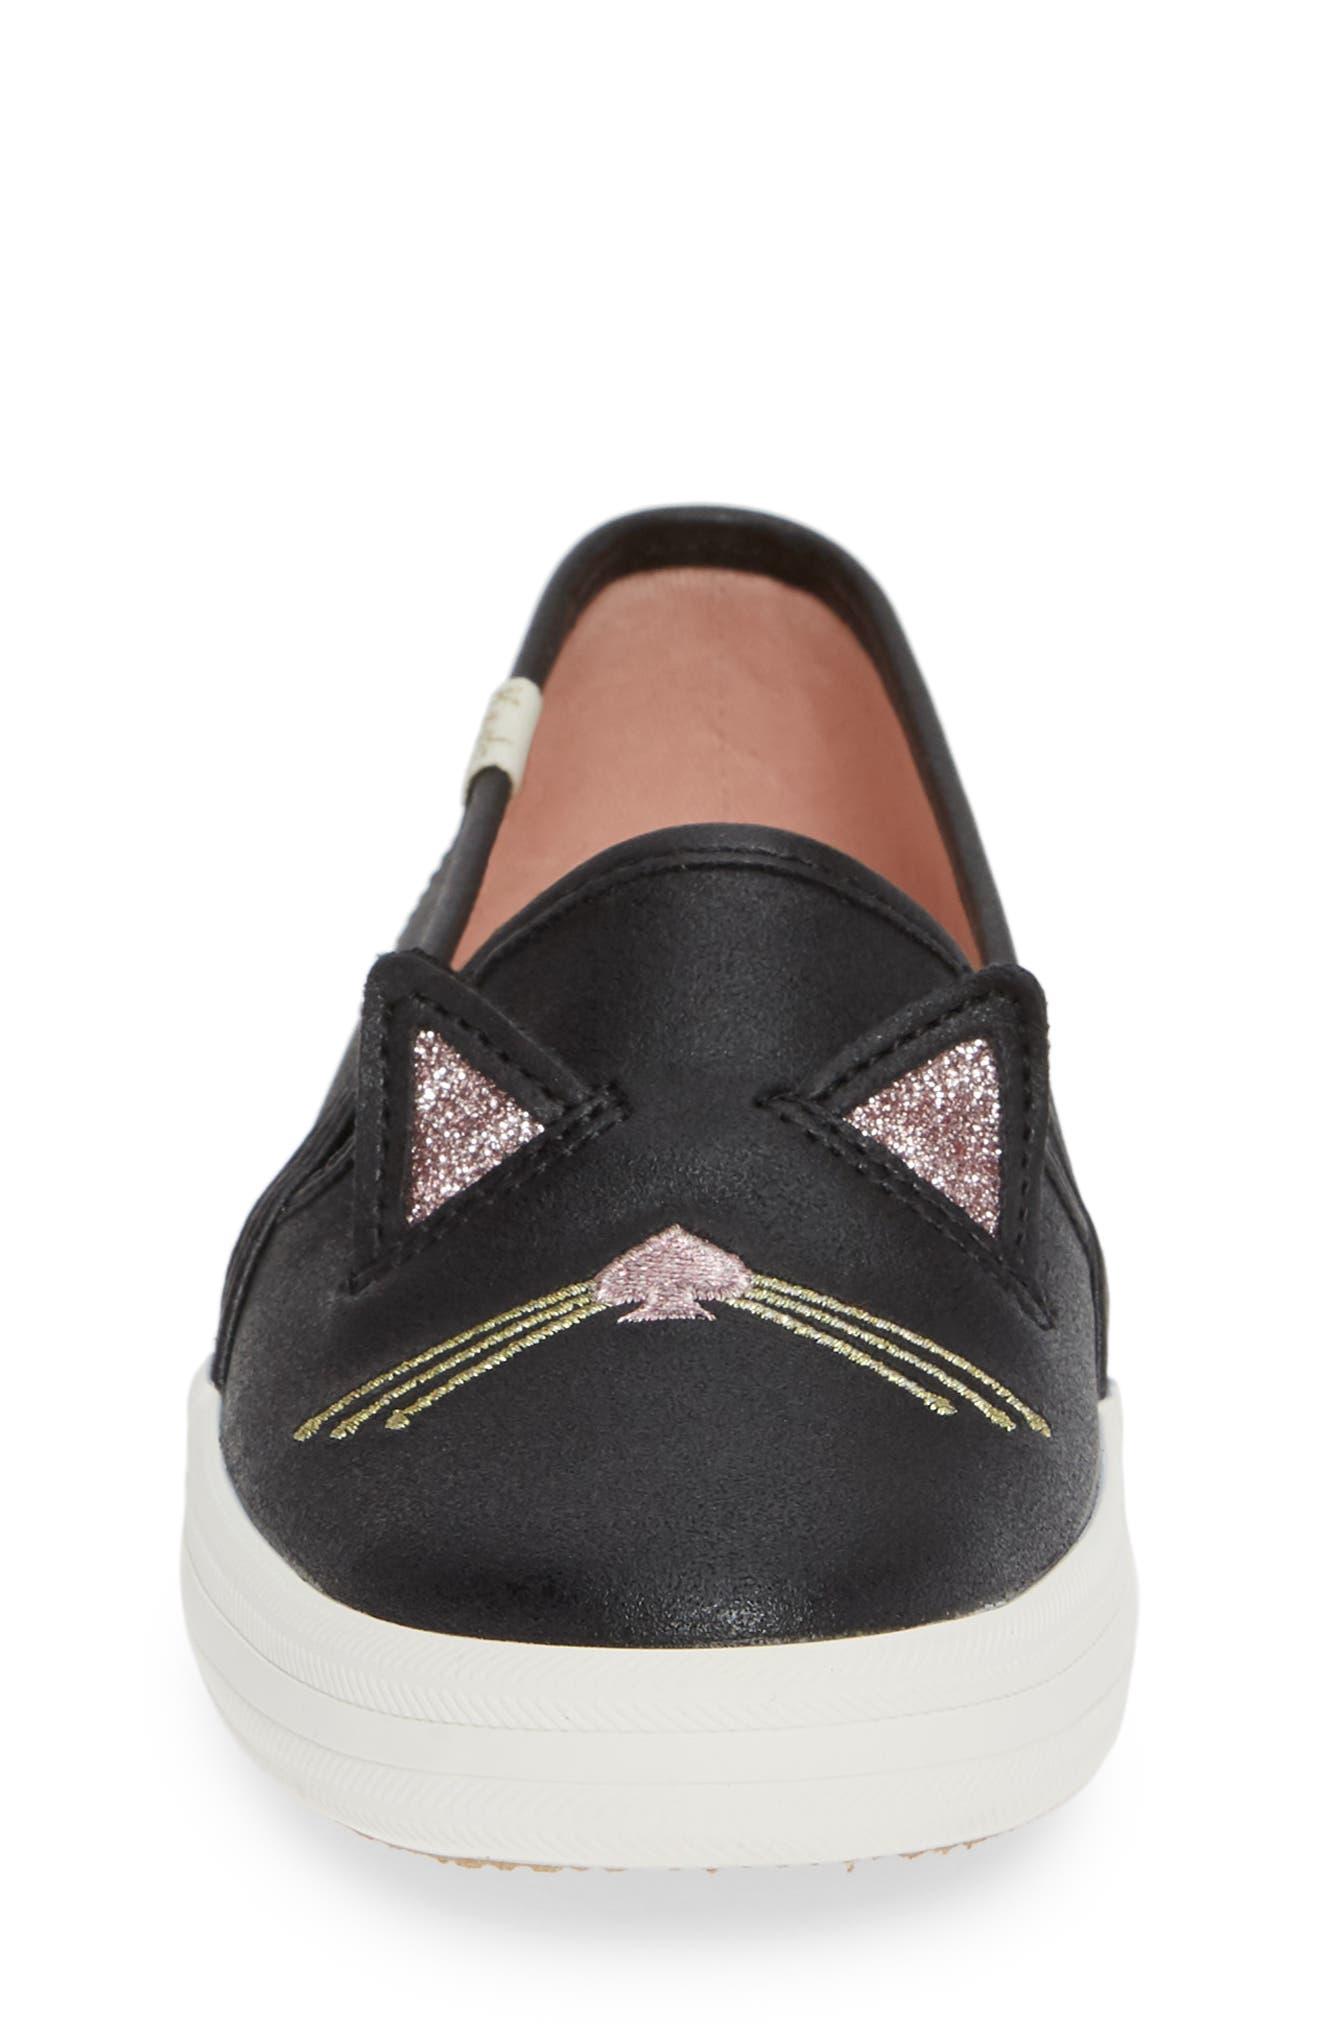 x kate spade new york Double Decker Sneaker,                             Alternate thumbnail 4, color,                             HAYDEN CAT